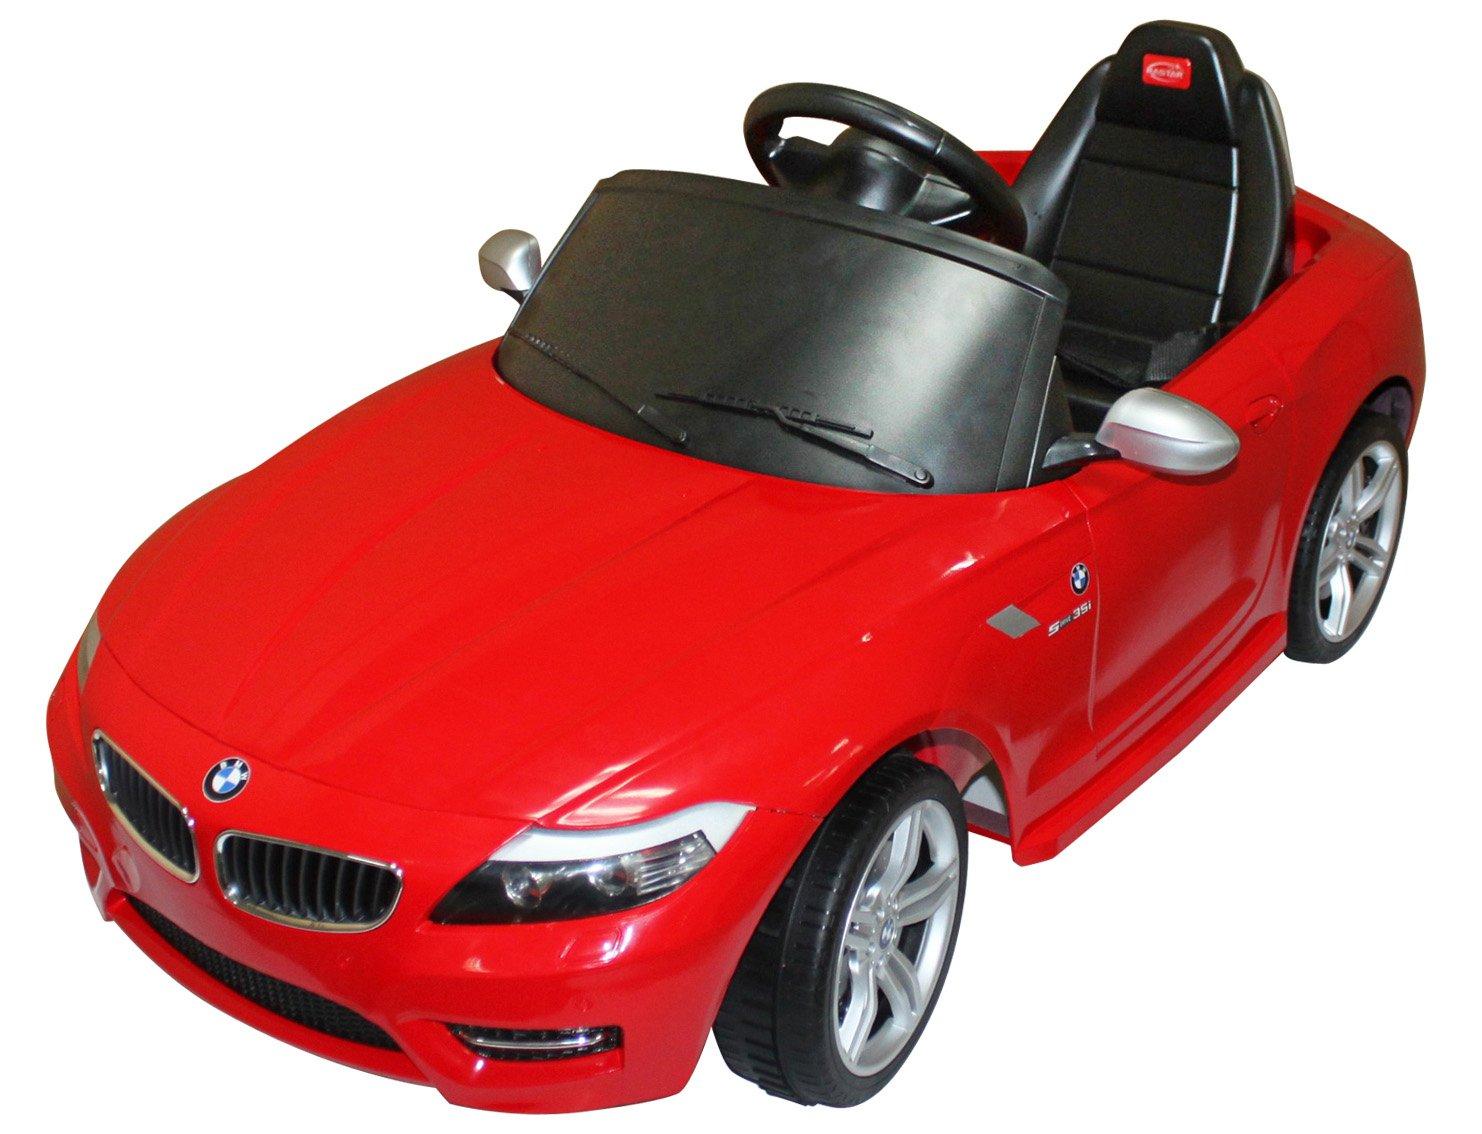 Vroom Rider BMW Z4 Rastar 6V Battery Operated/Remote Controlled Ride-On, Red smoby машинка vroom planet цвет красный желтый